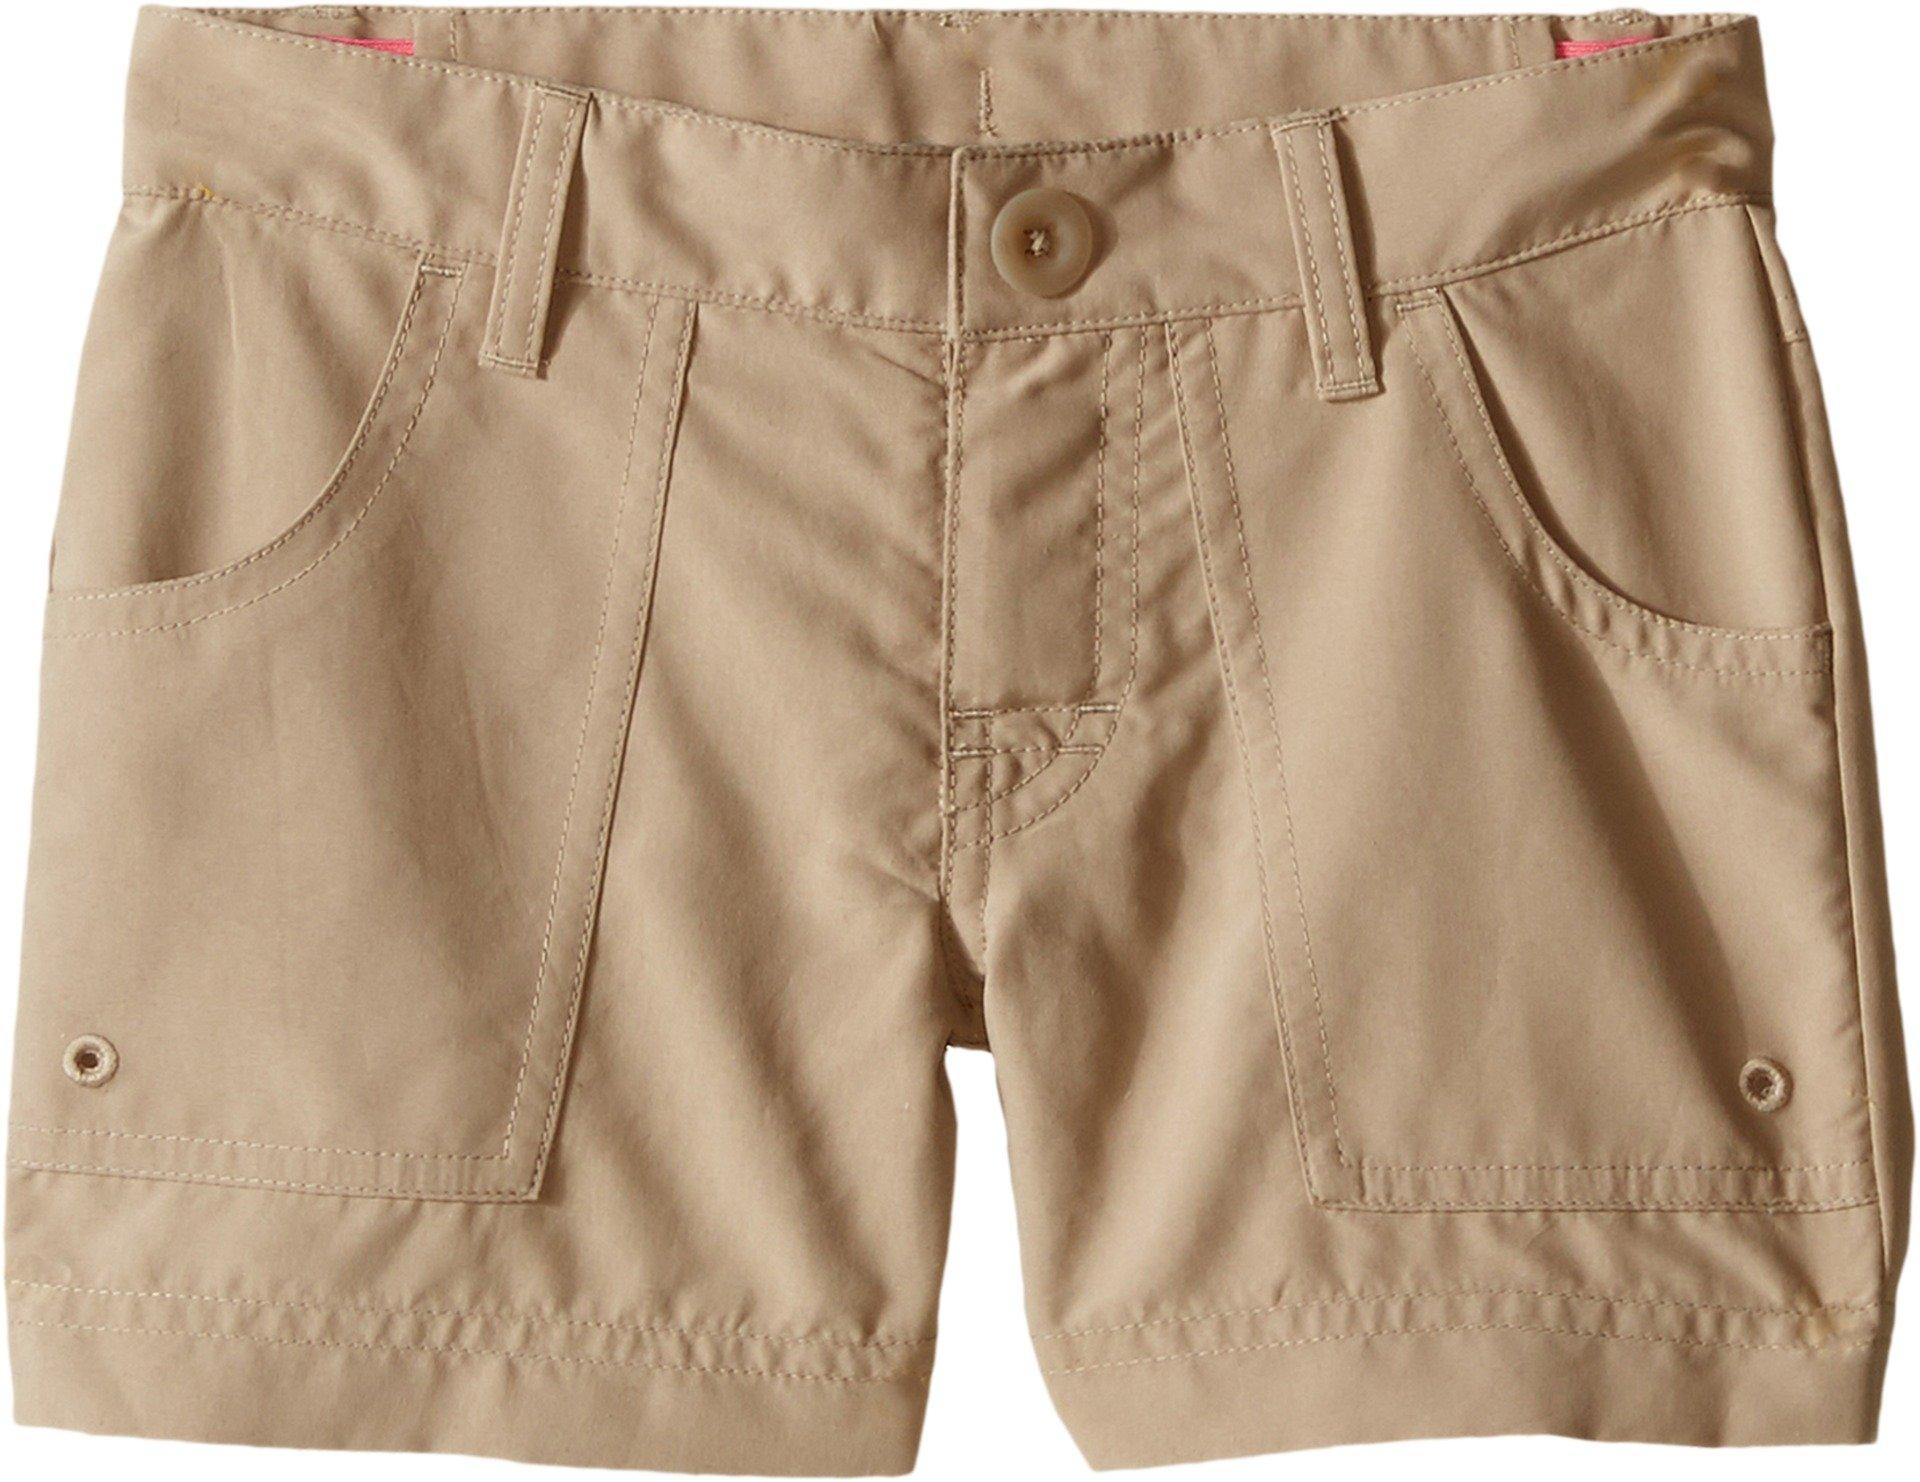 The North Face Kids Girl's Argali Hike/Water Shorts (Little Kids/Big Kids) Dune Beige/Dune Beige S (7/8 Big Kids) X One Size